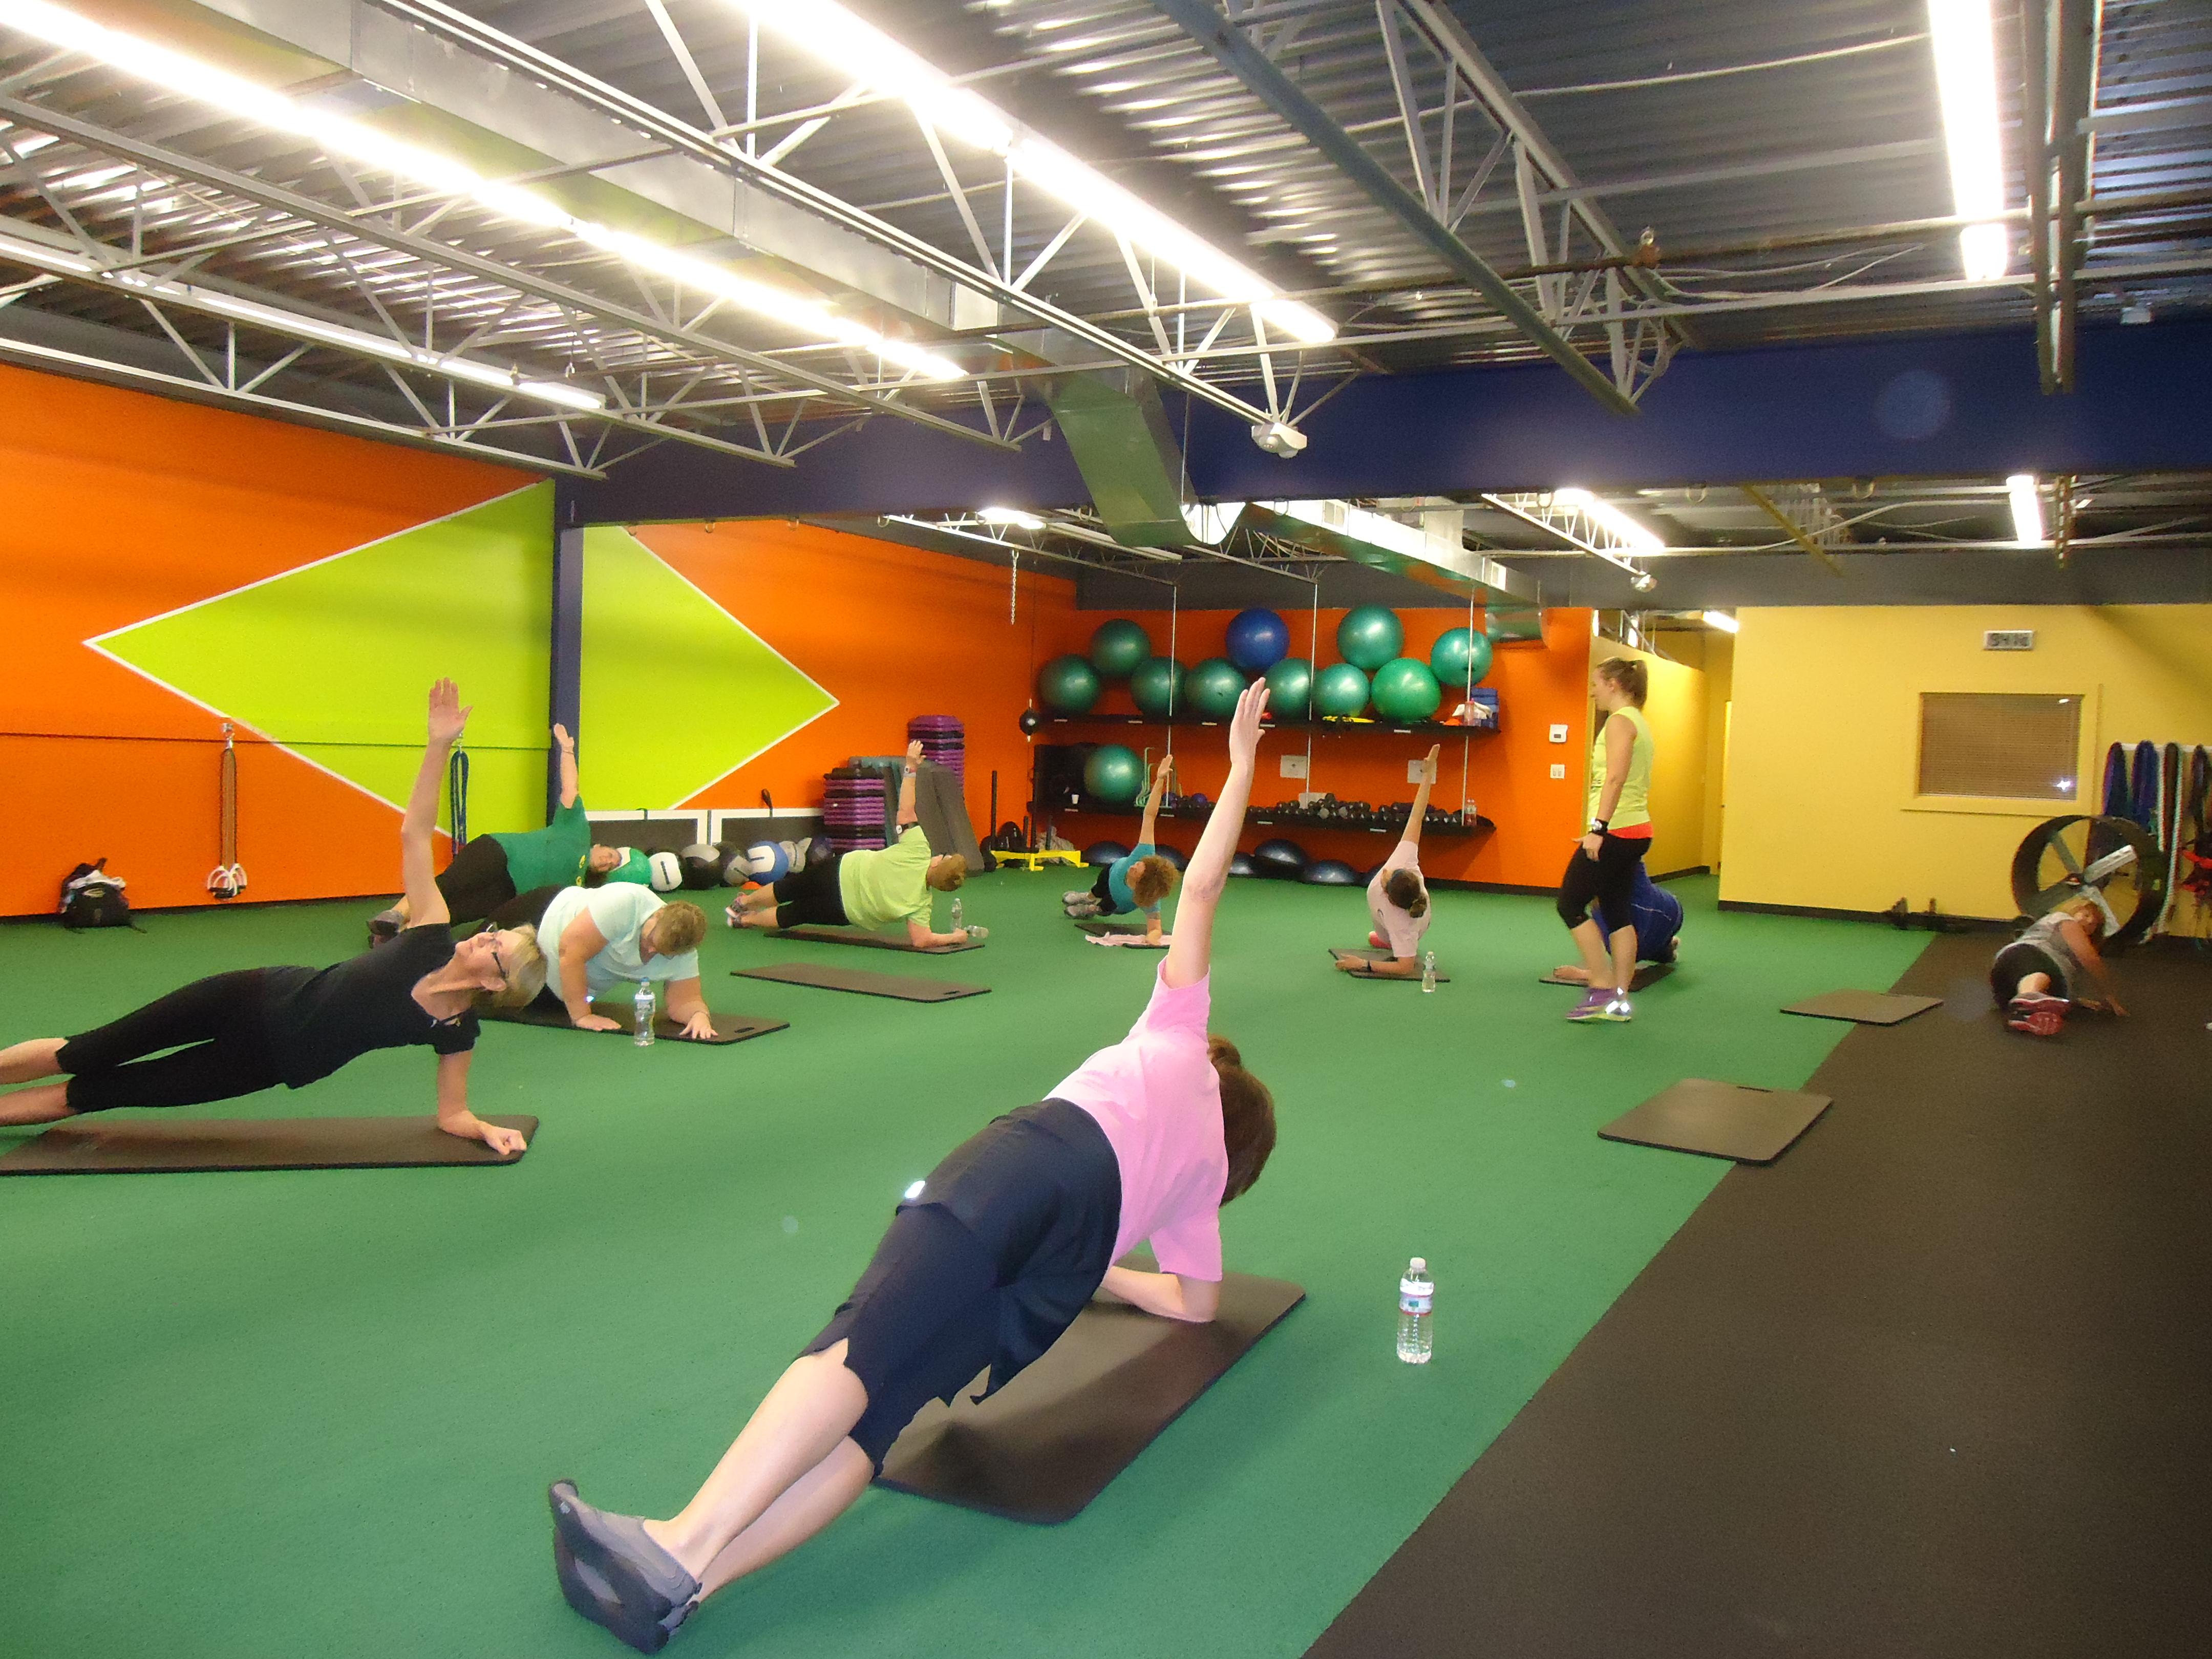 Everybodys Fitness Center image 6